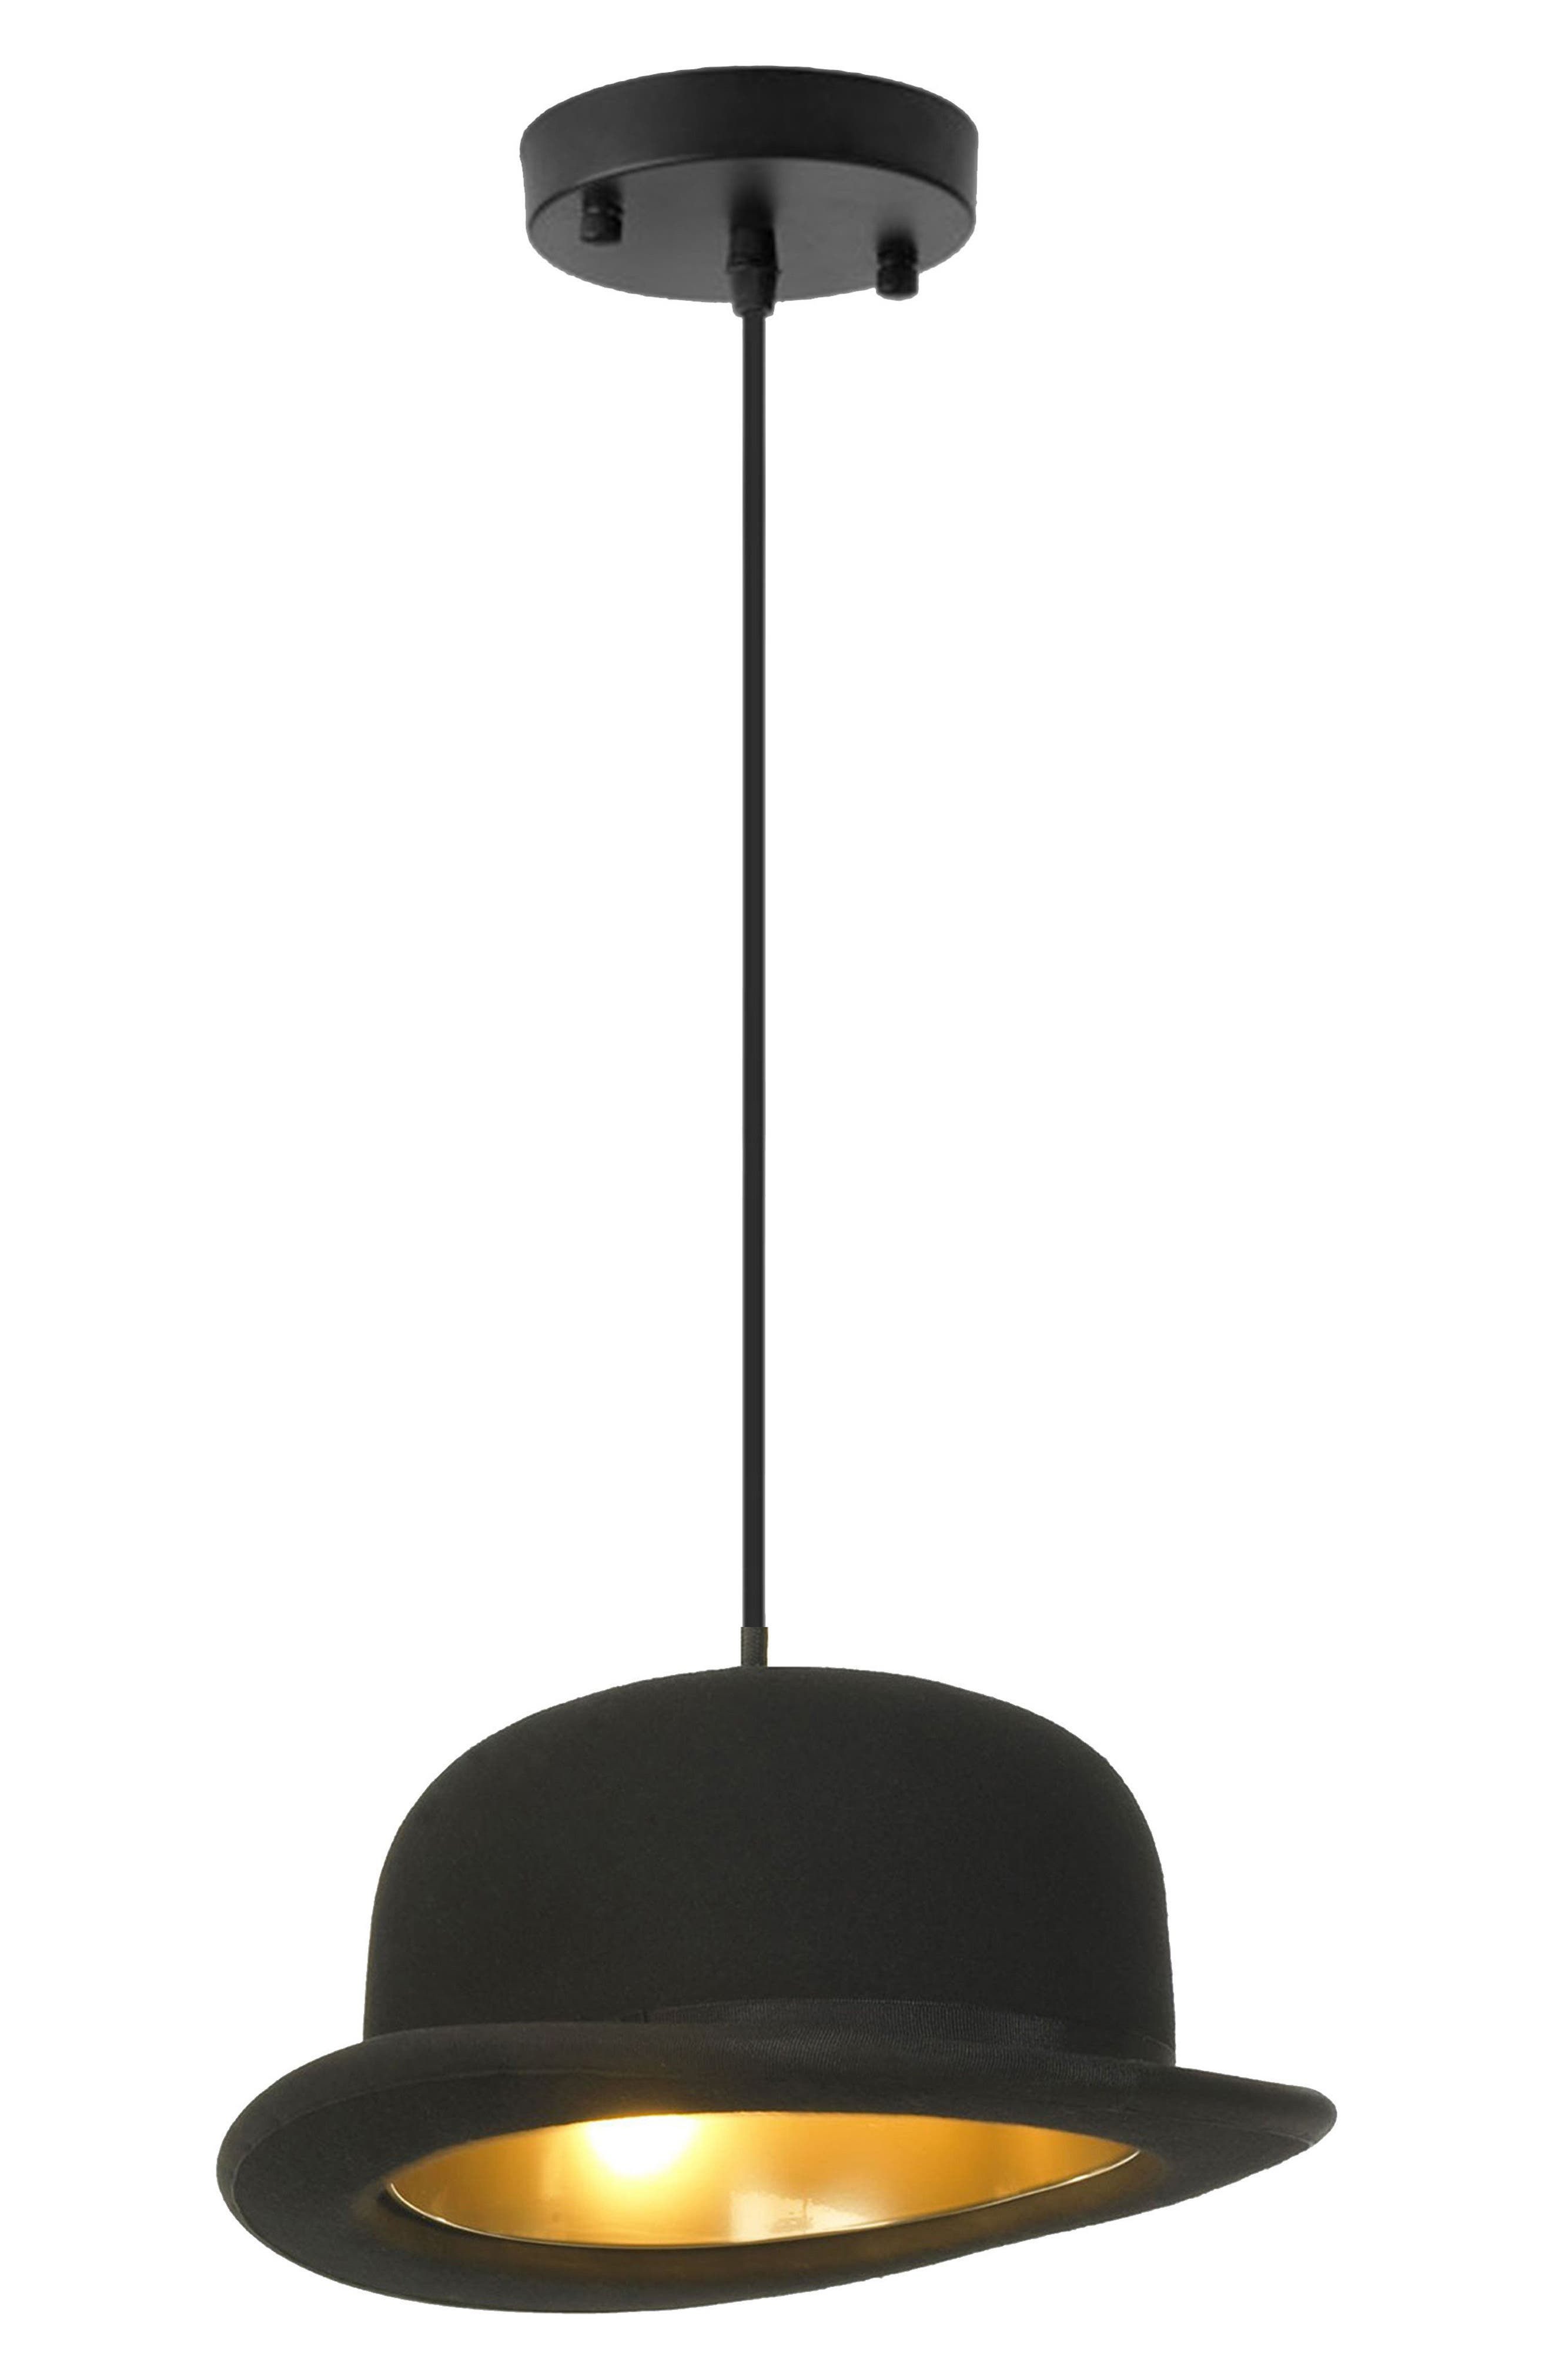 Alternate Image 1 Selected - Renwil Blaxton Bowler Hat Ceiling Fixture